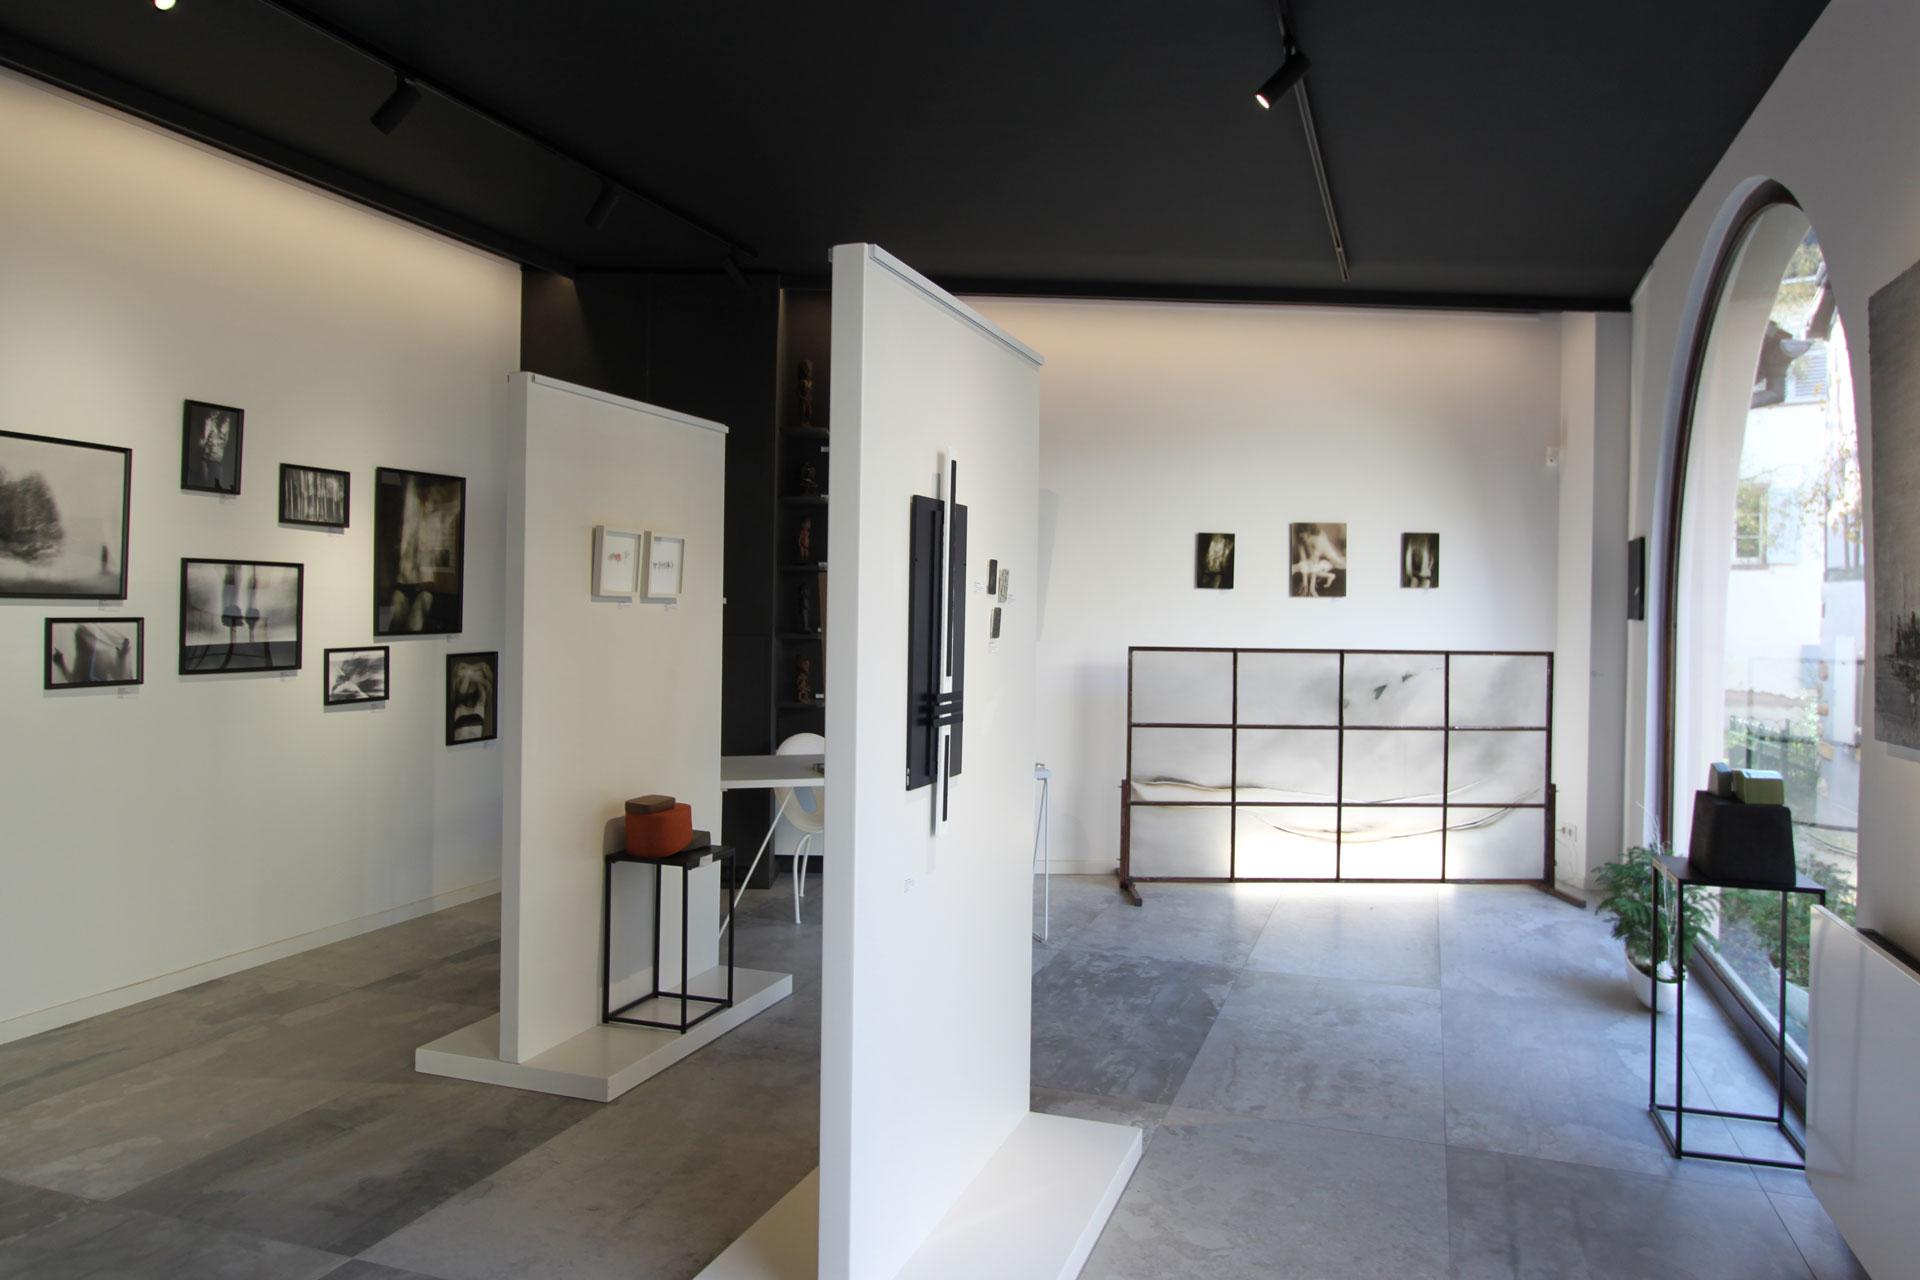 Exposition fragments d'un discours féminin Galerie Murmure Colmar